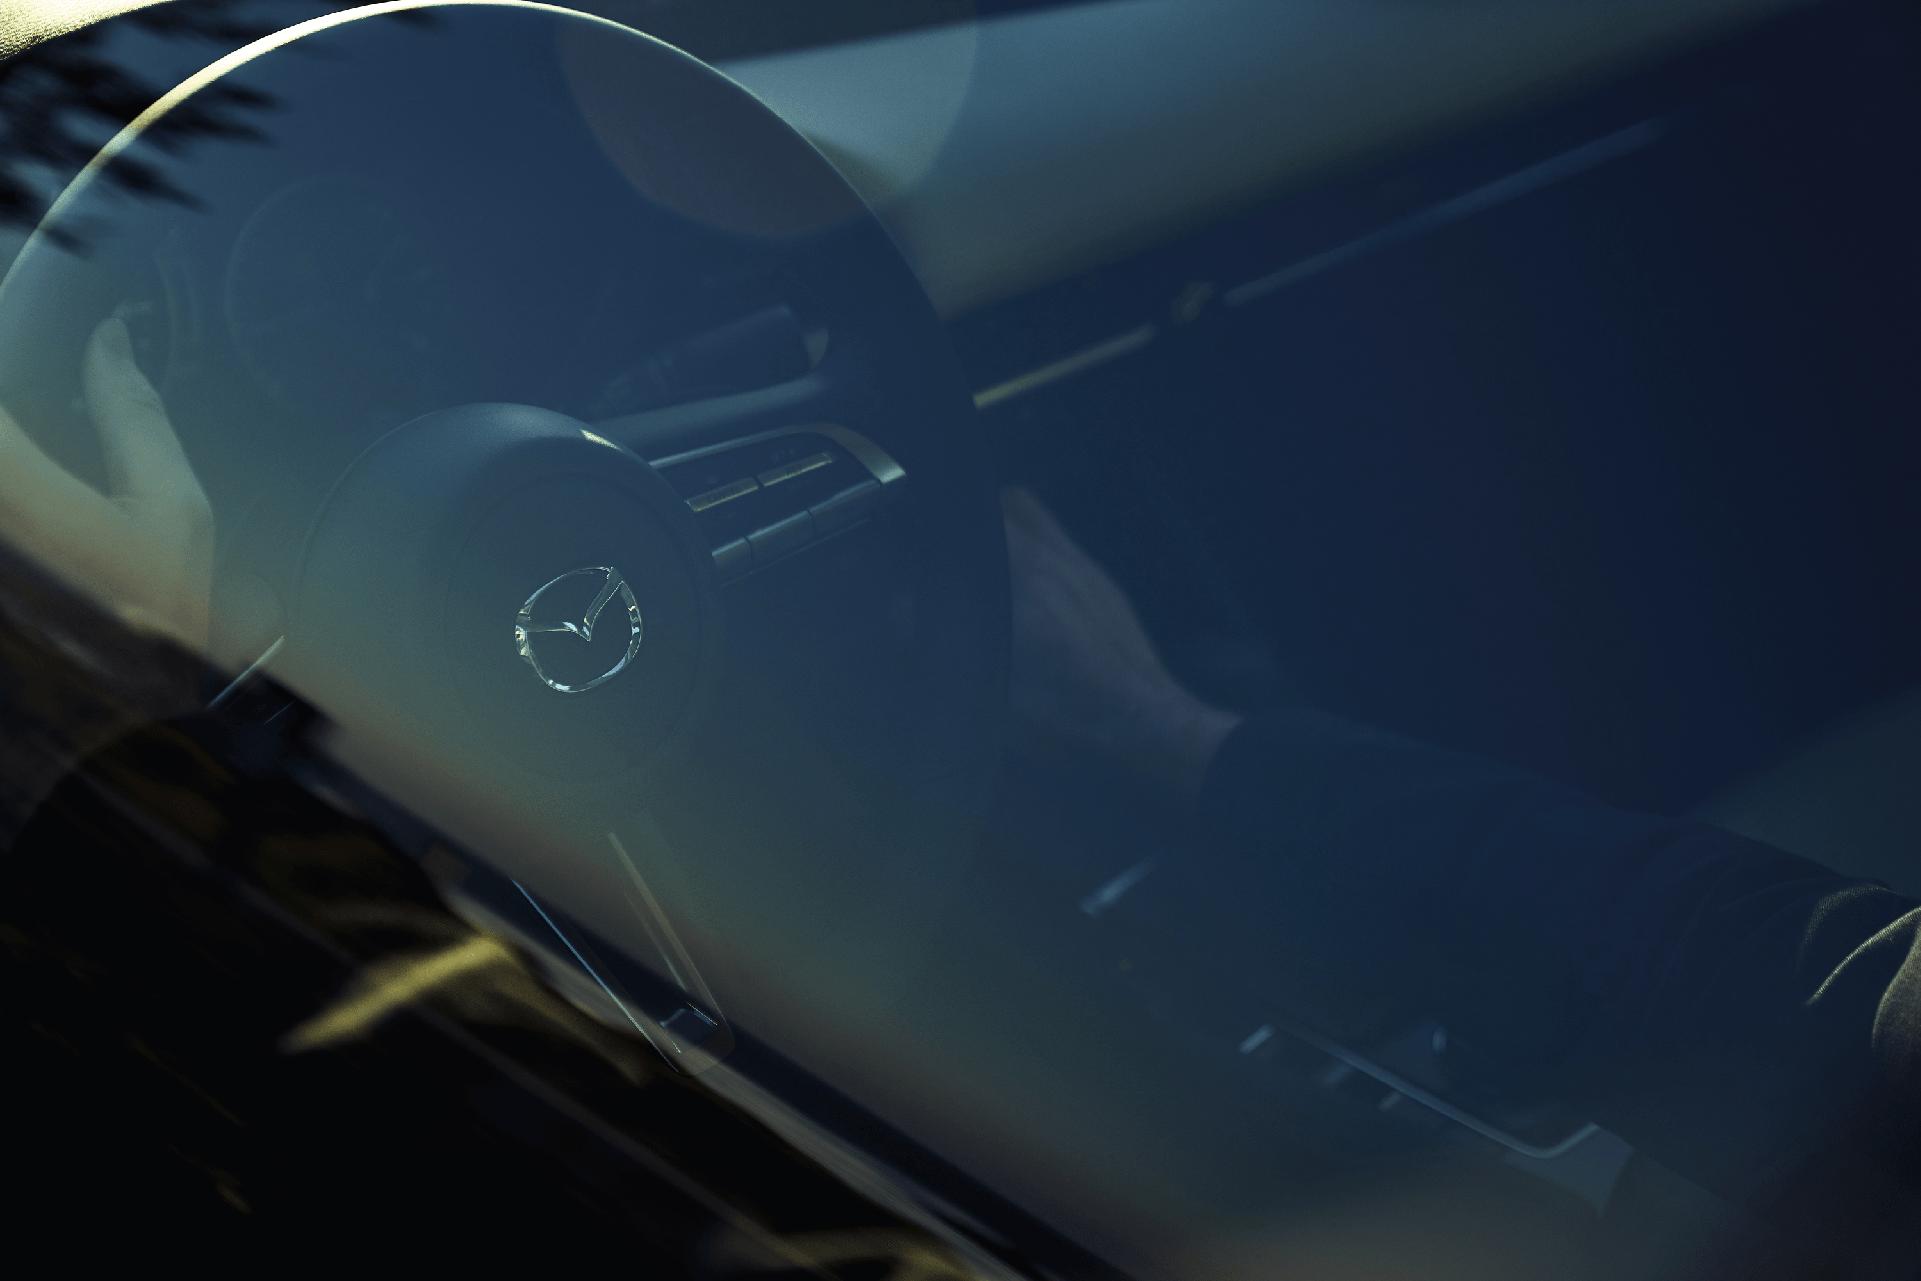 2019_Mazda3 Sedan_Magazine_Issue34_Pacific Coast Highway_(2)_png (1)-min